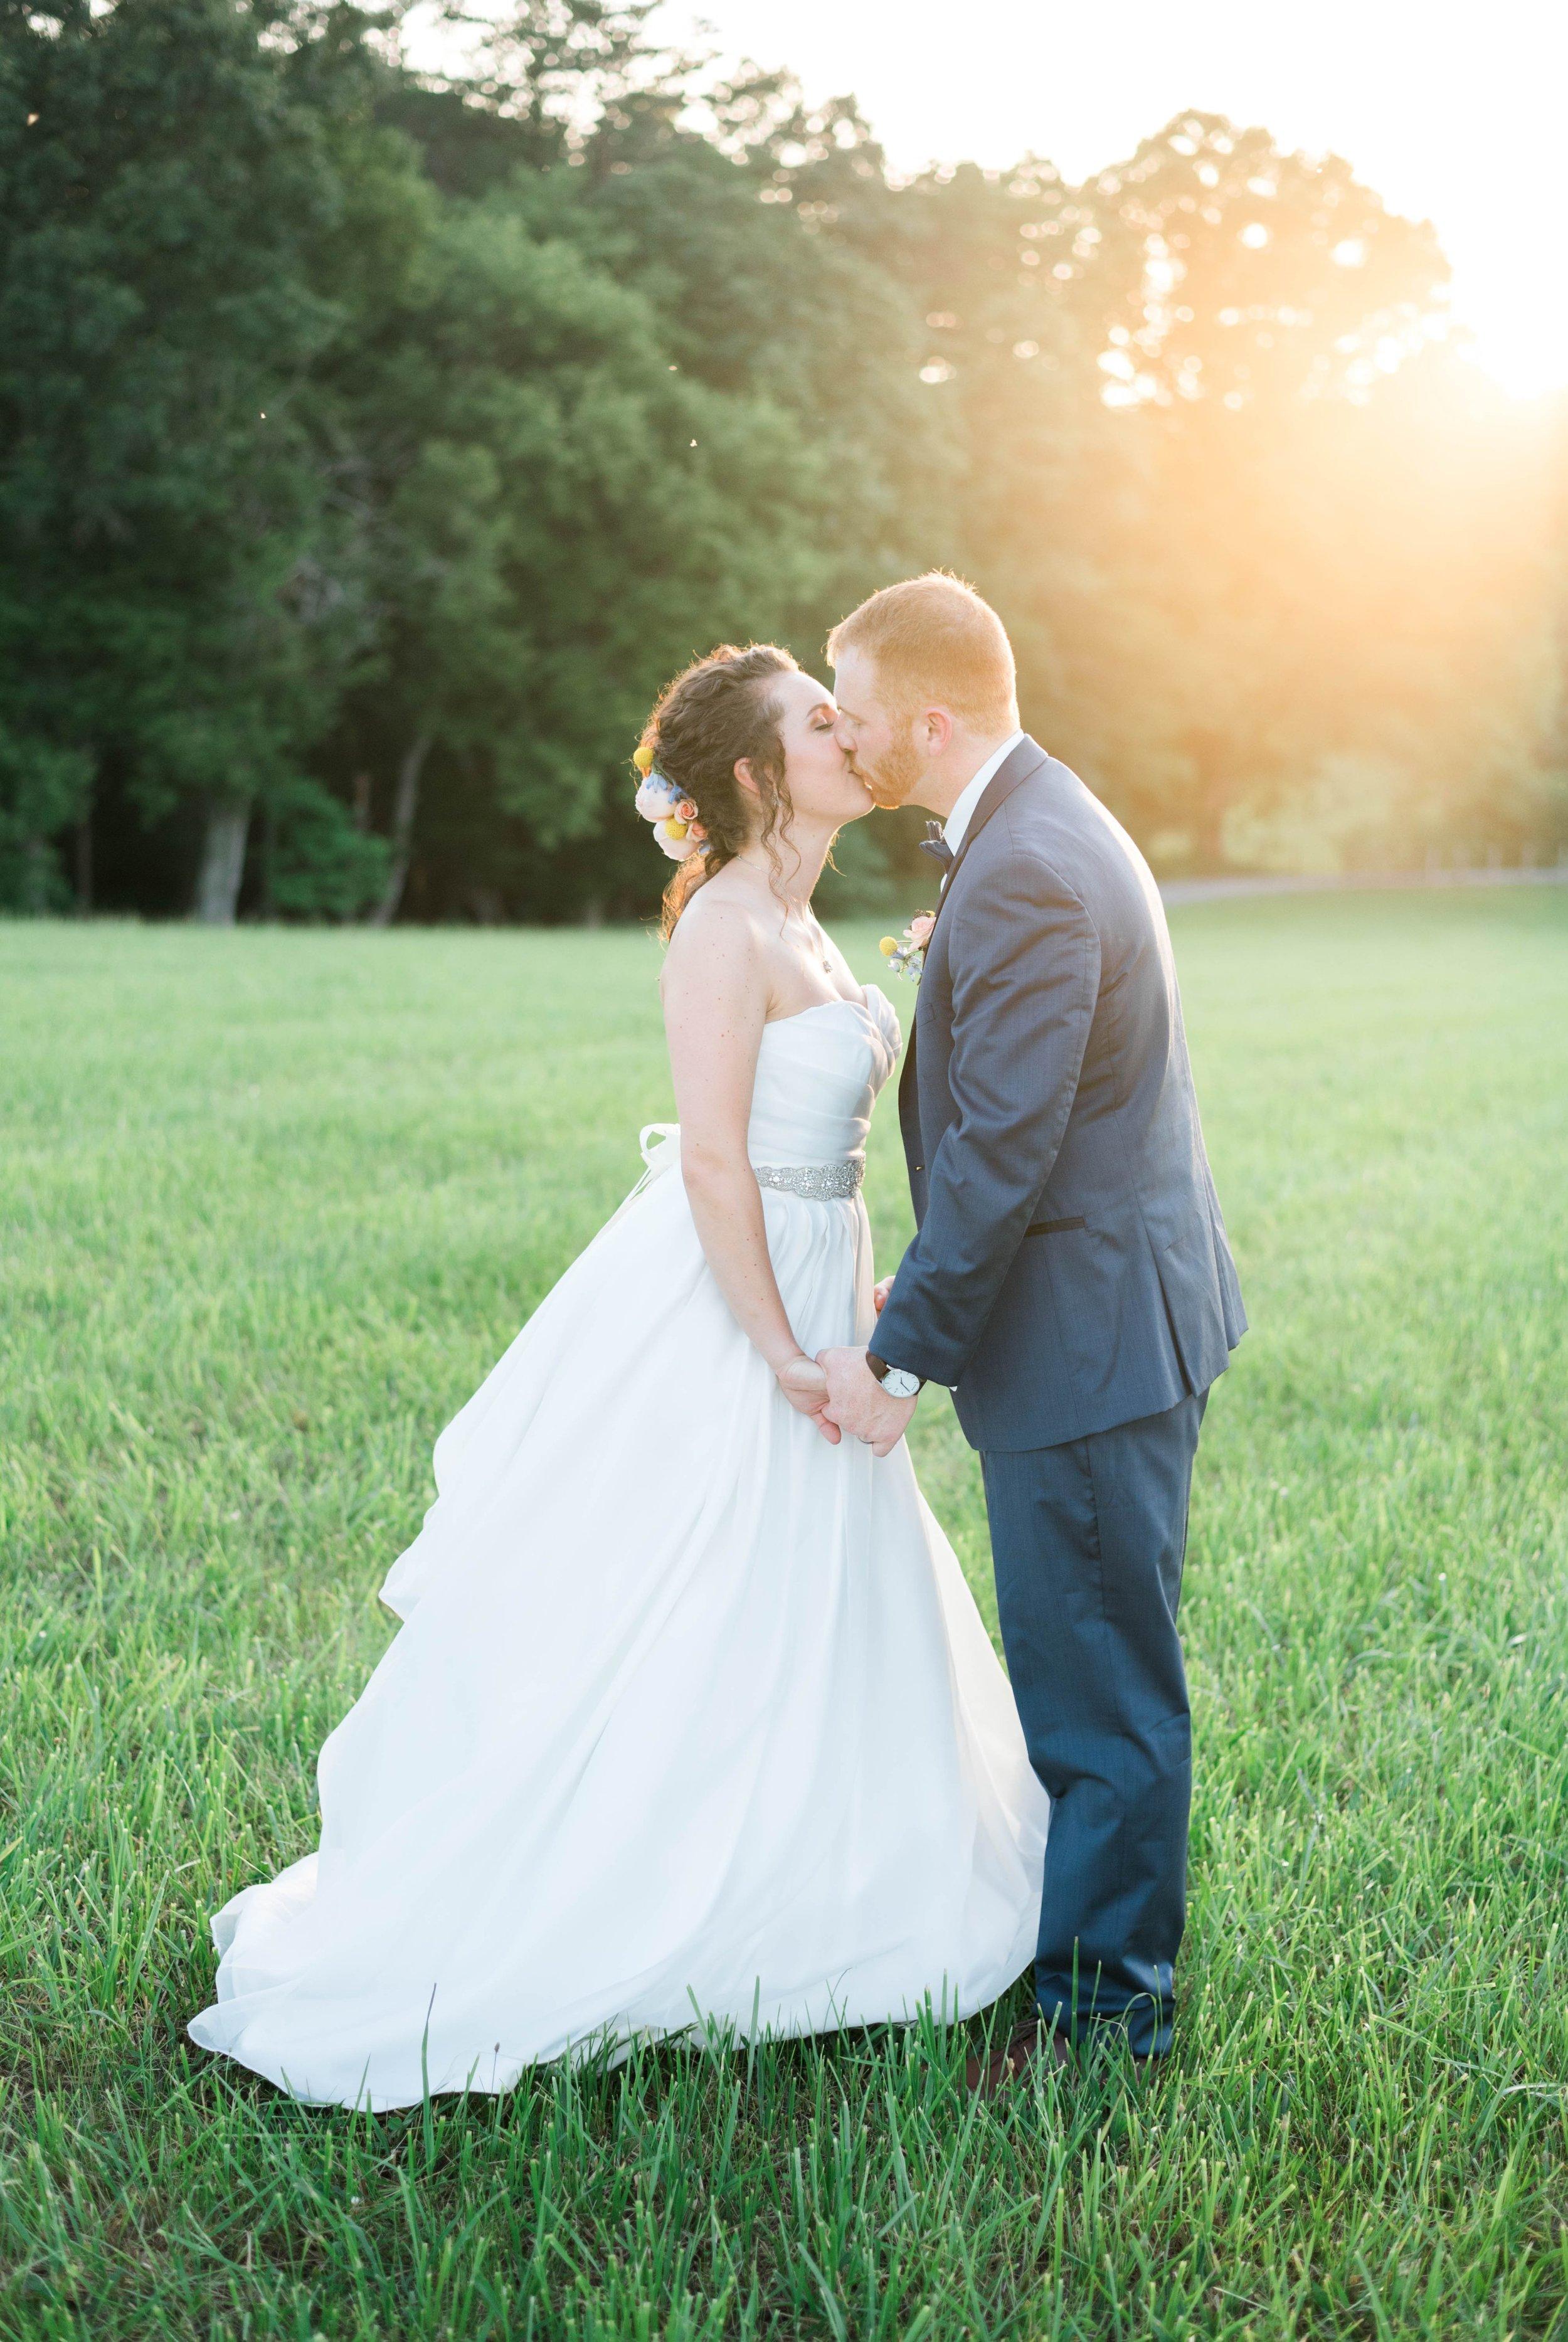 SorellaFarms_EvingtonVA_Lynchburgweddingphotographer_VirginiaweddingPhotographer_AshleyAndrewSorellaFarmsWedding 23.jpg